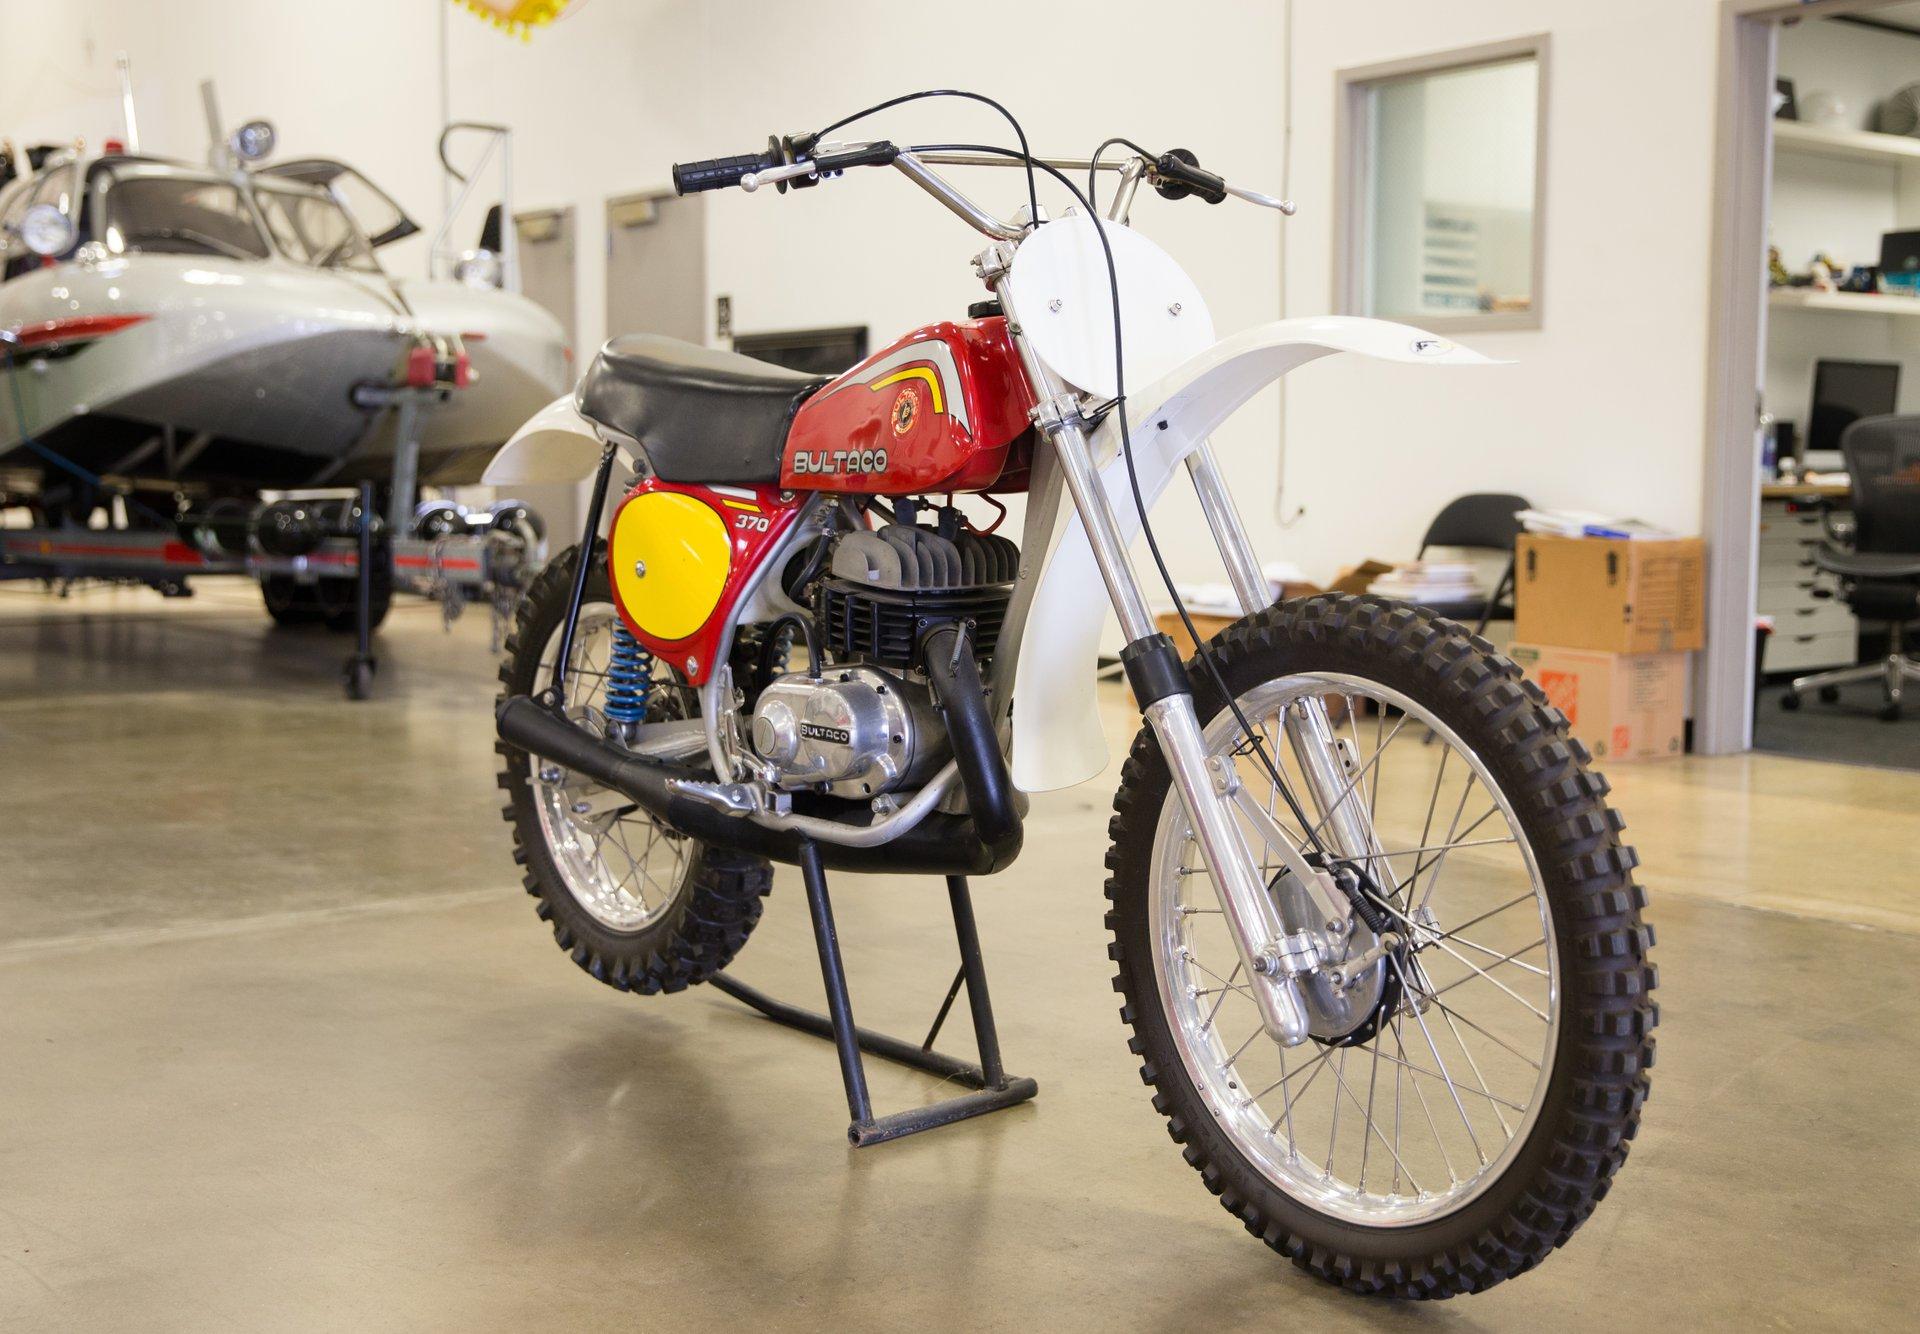 1977 Bultaco #193 Pursang 370 MK 10 for sale #108417 | MCG